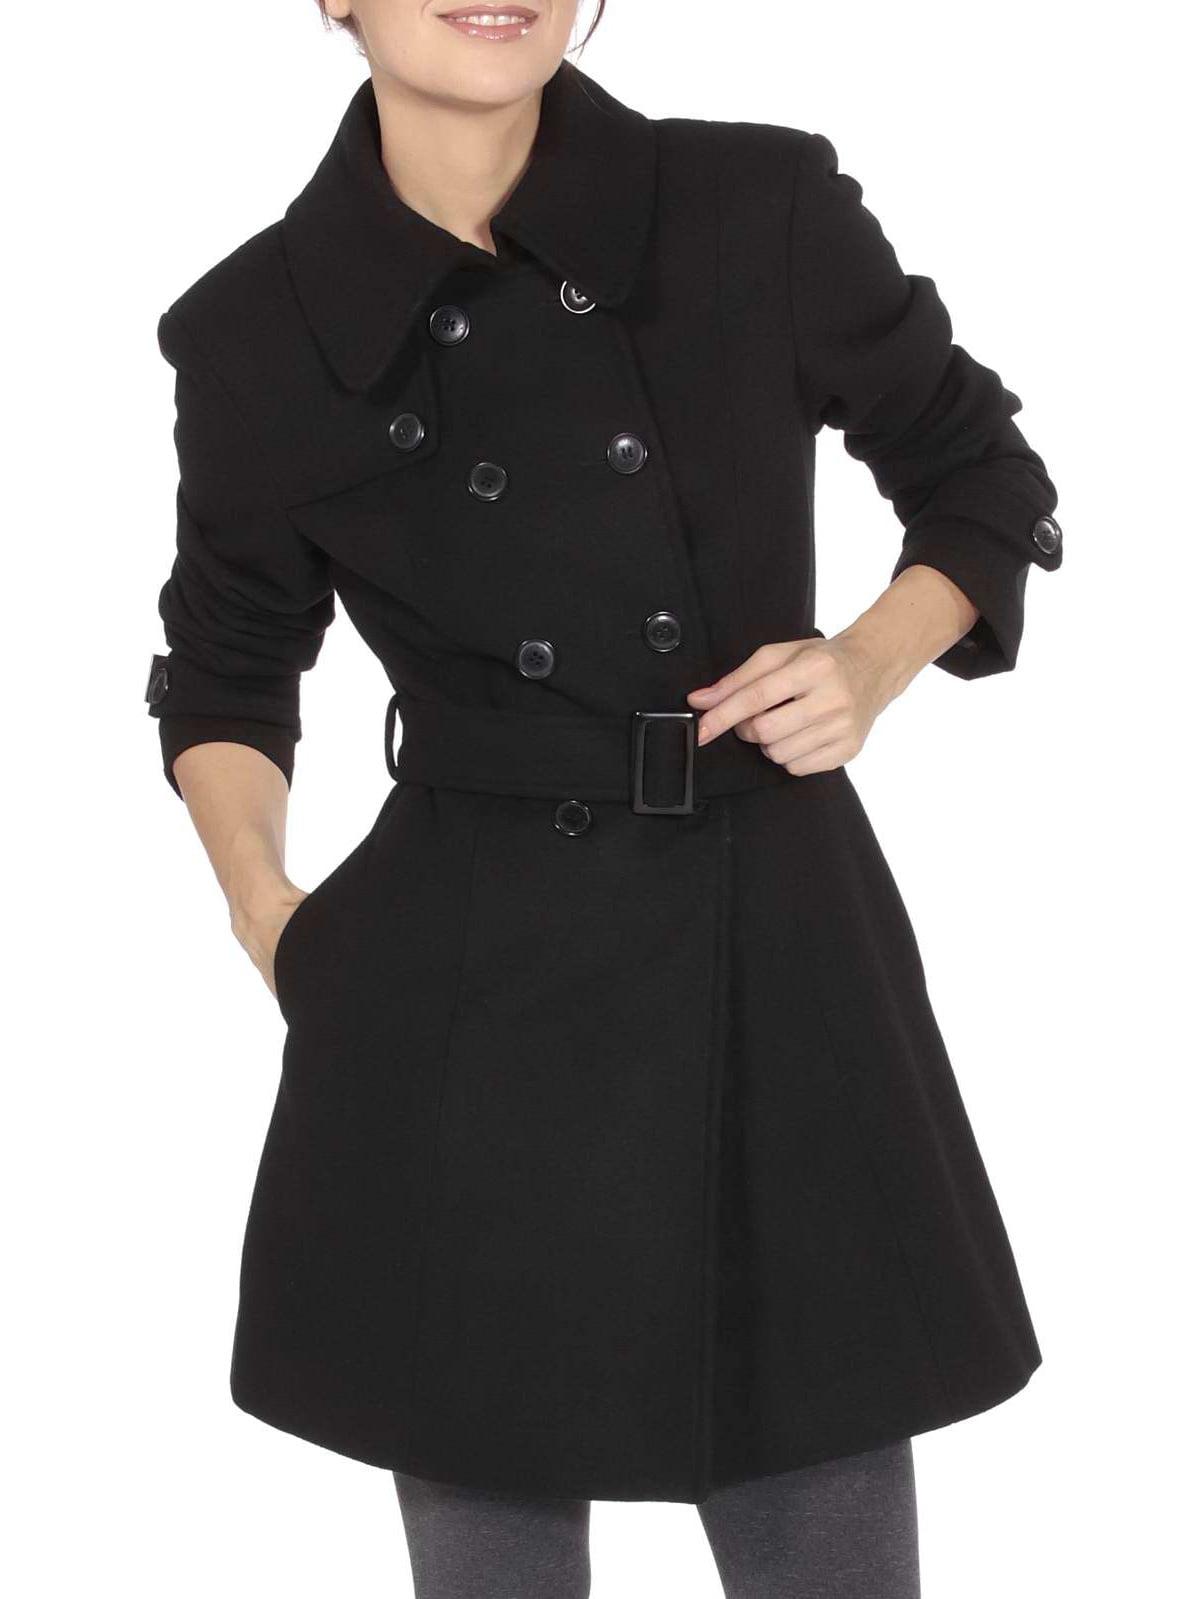 9756050ee3 Alpine Swiss - Keira Women s Trench Coat Double Breasted Wool Jacket Belted  Blazer Black Large - Walmart.com